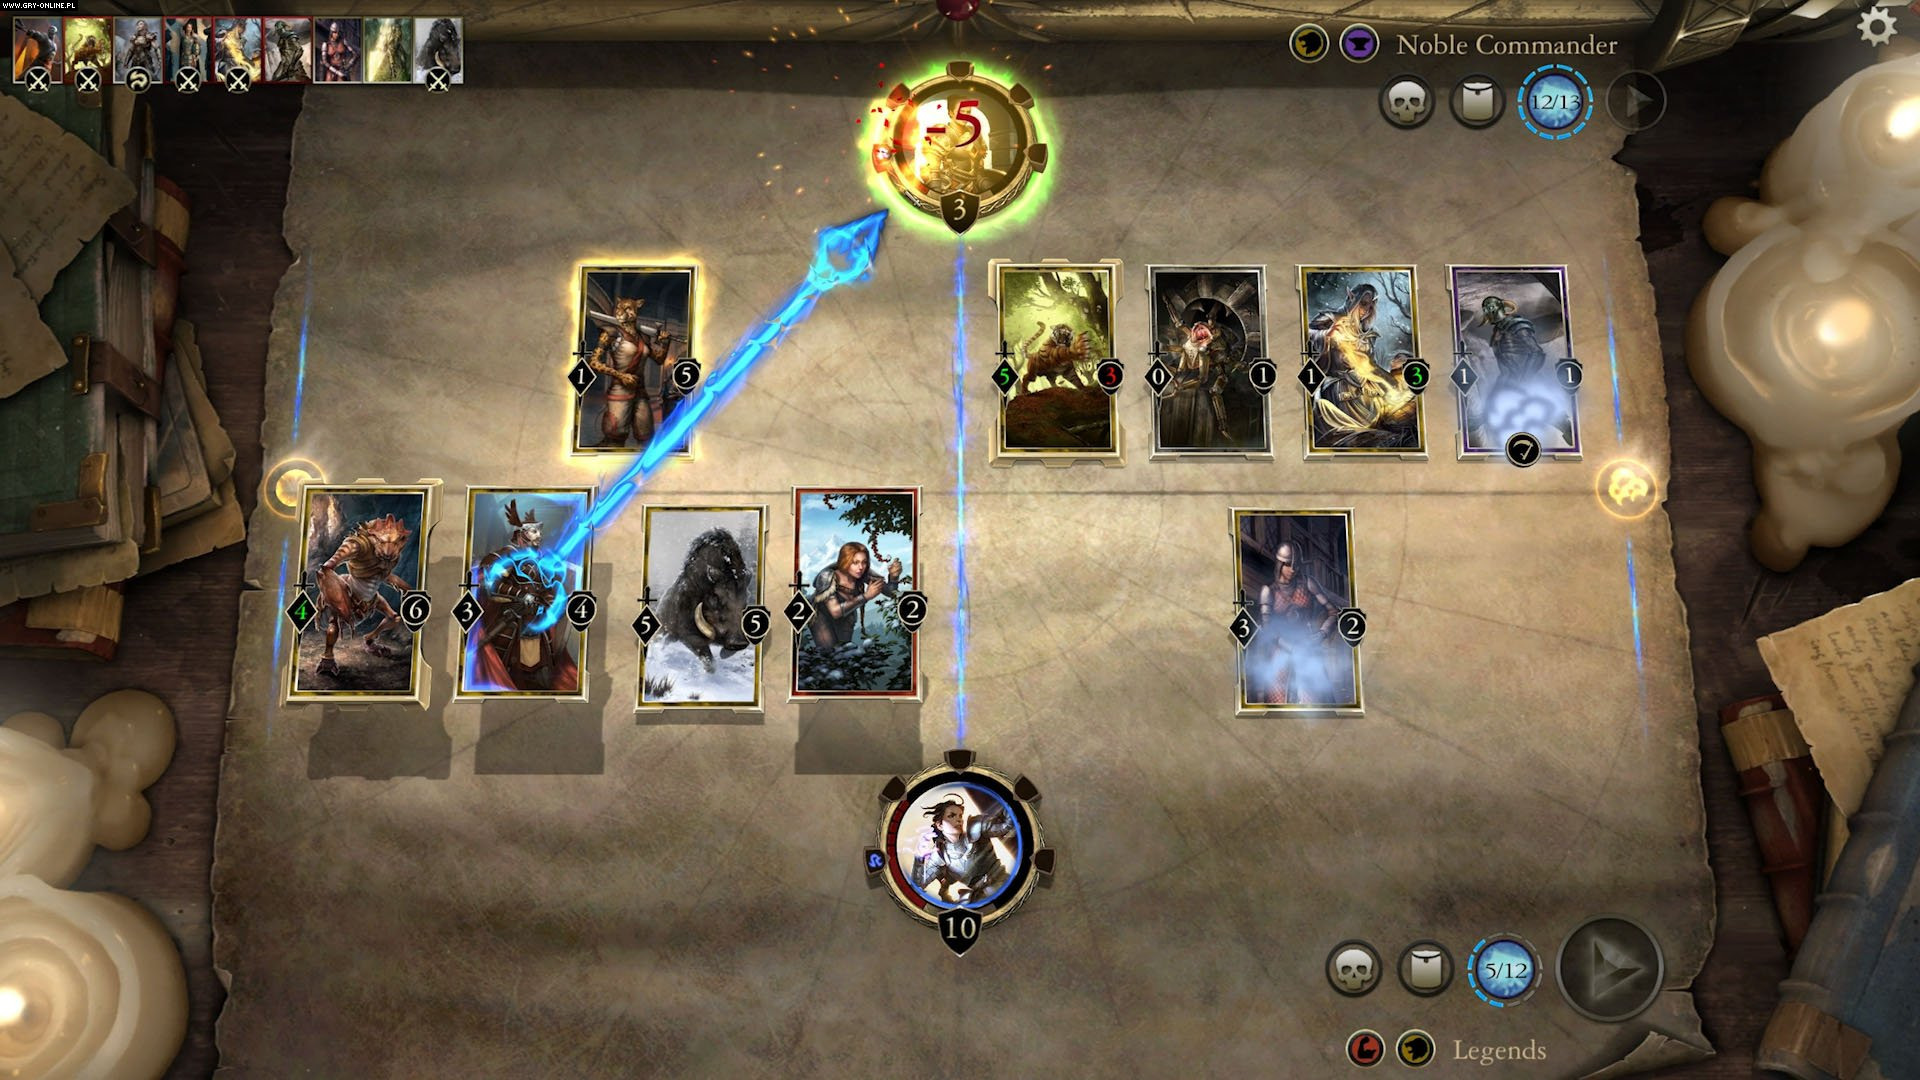 The Elder Scrolls: Legends PC, iOS Games Image 2/6, Bethesda Softworks